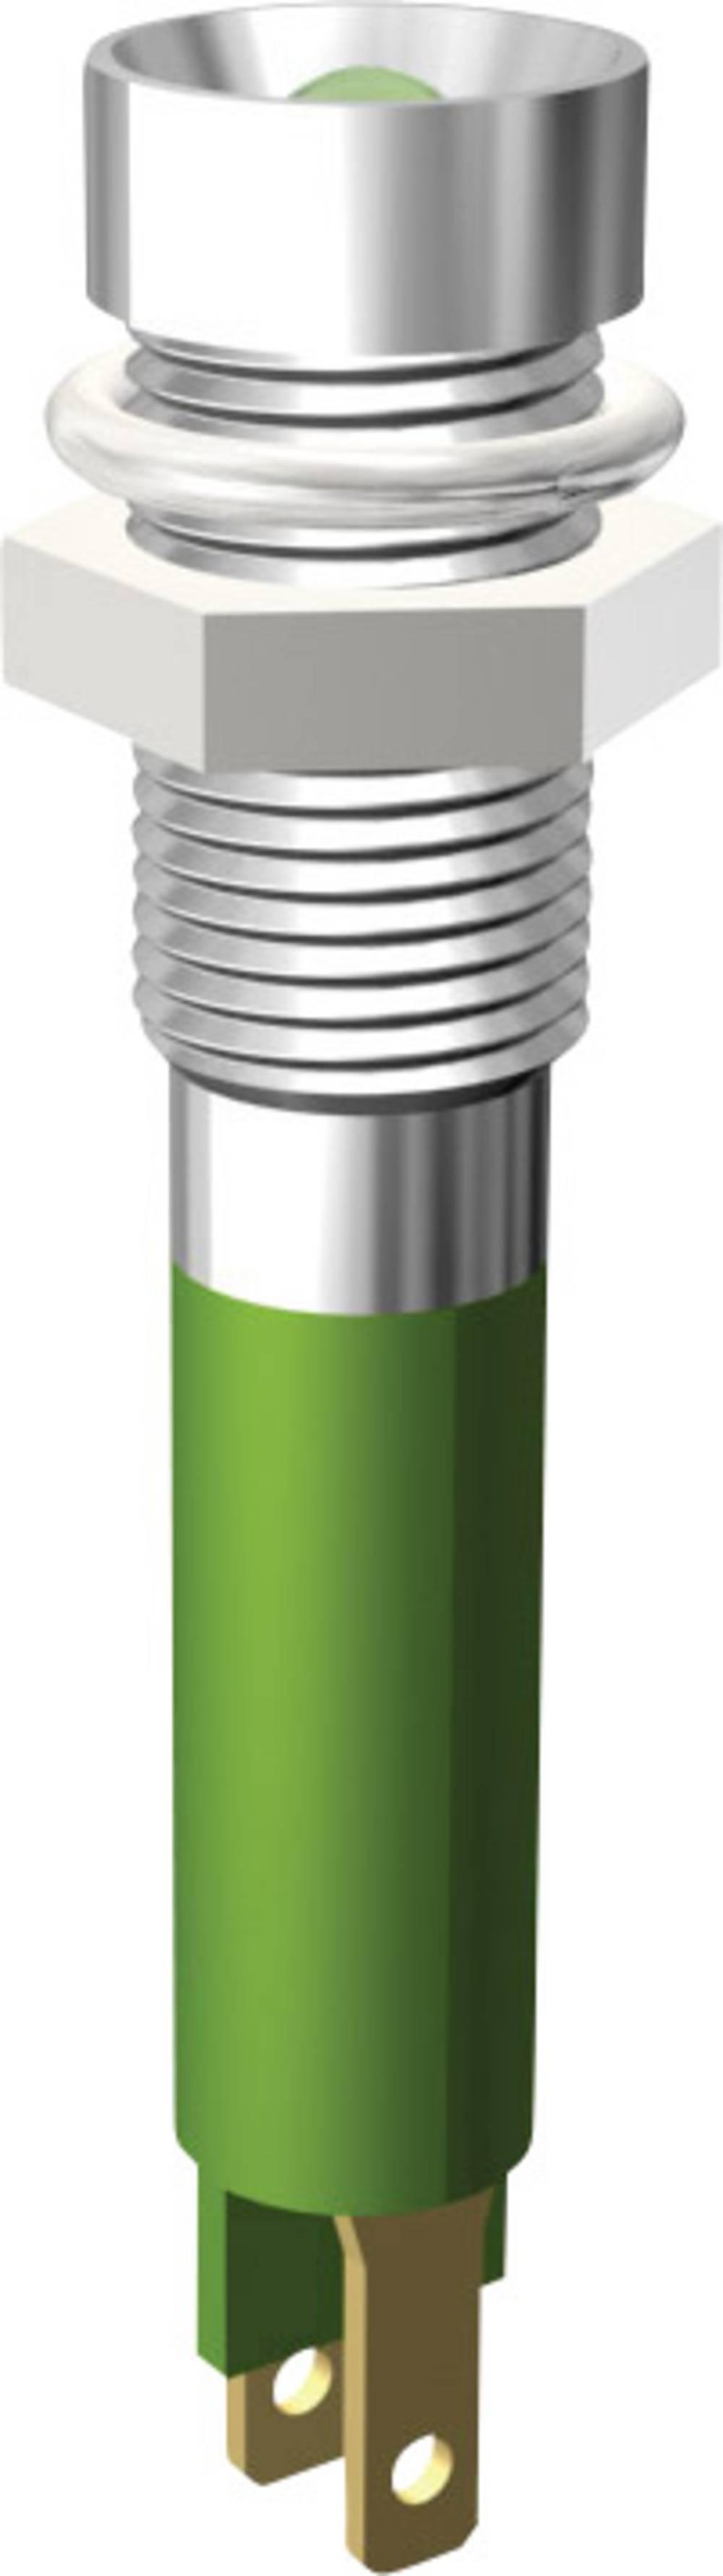 LED signalno svjetlo, zeleno 24 V/DC Signal Construct SMZD06214